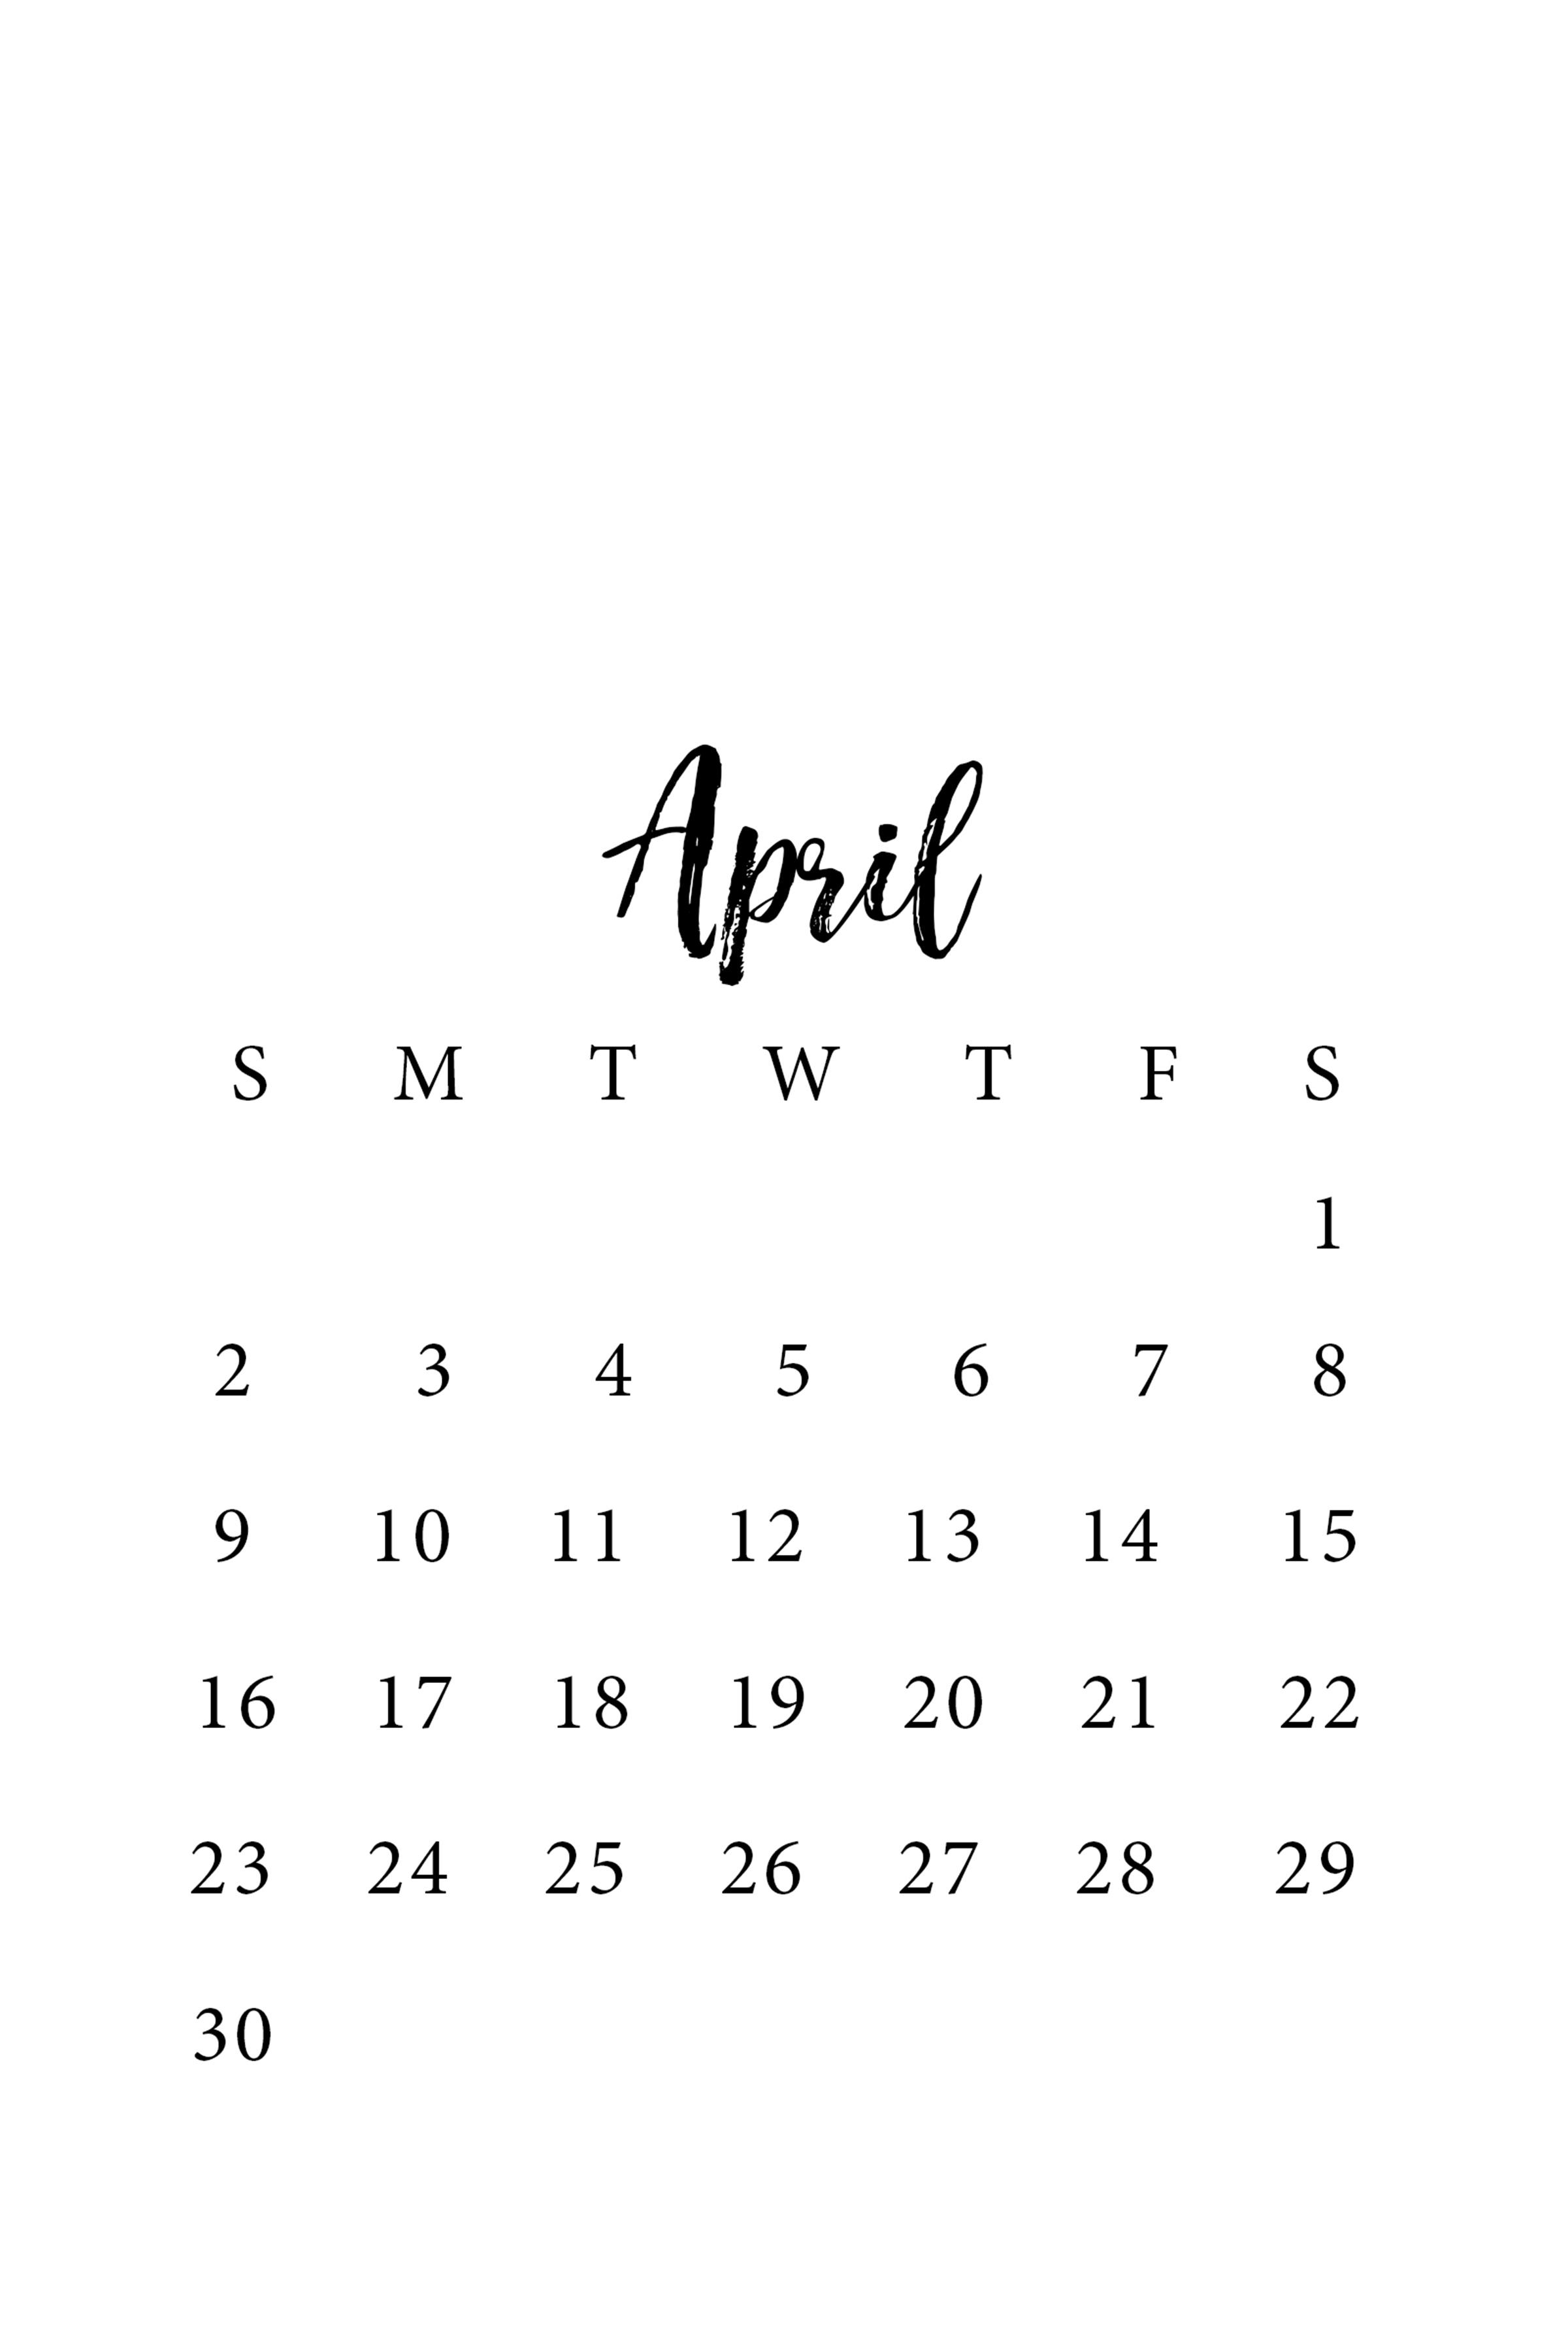 DIY photo gifts: 2017 photo calendar - Miss Freddy